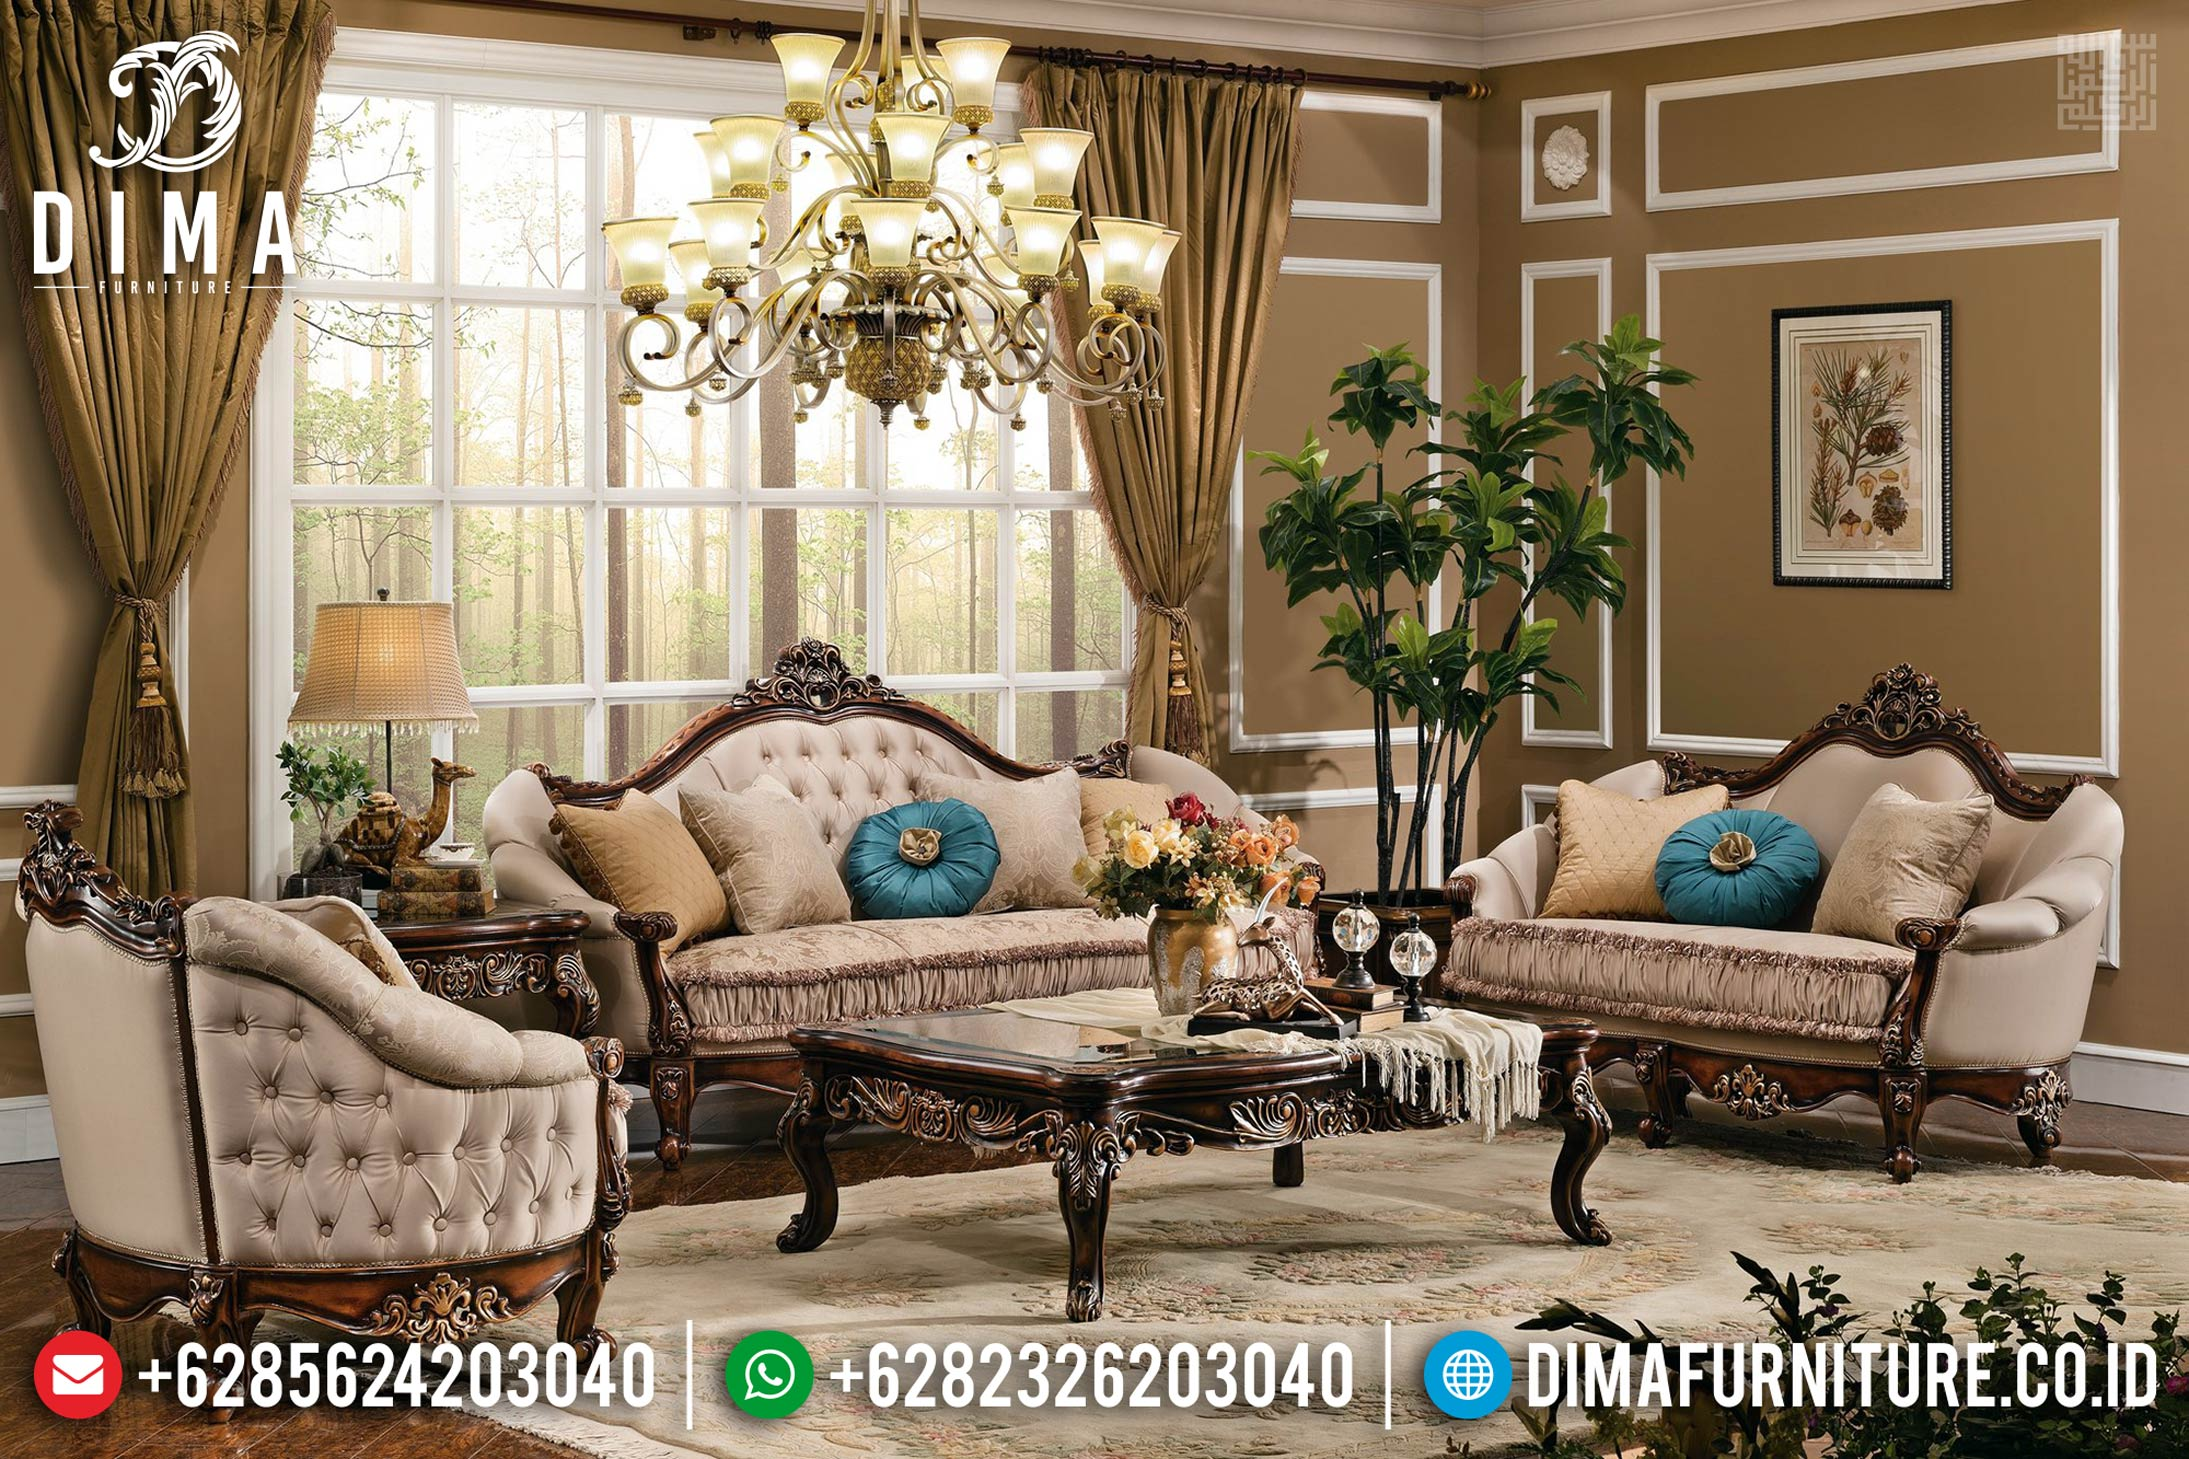 Sofa Tamu Mewah Jati Natural Mahkota Ukiran Classic Luxury MMJ-0421